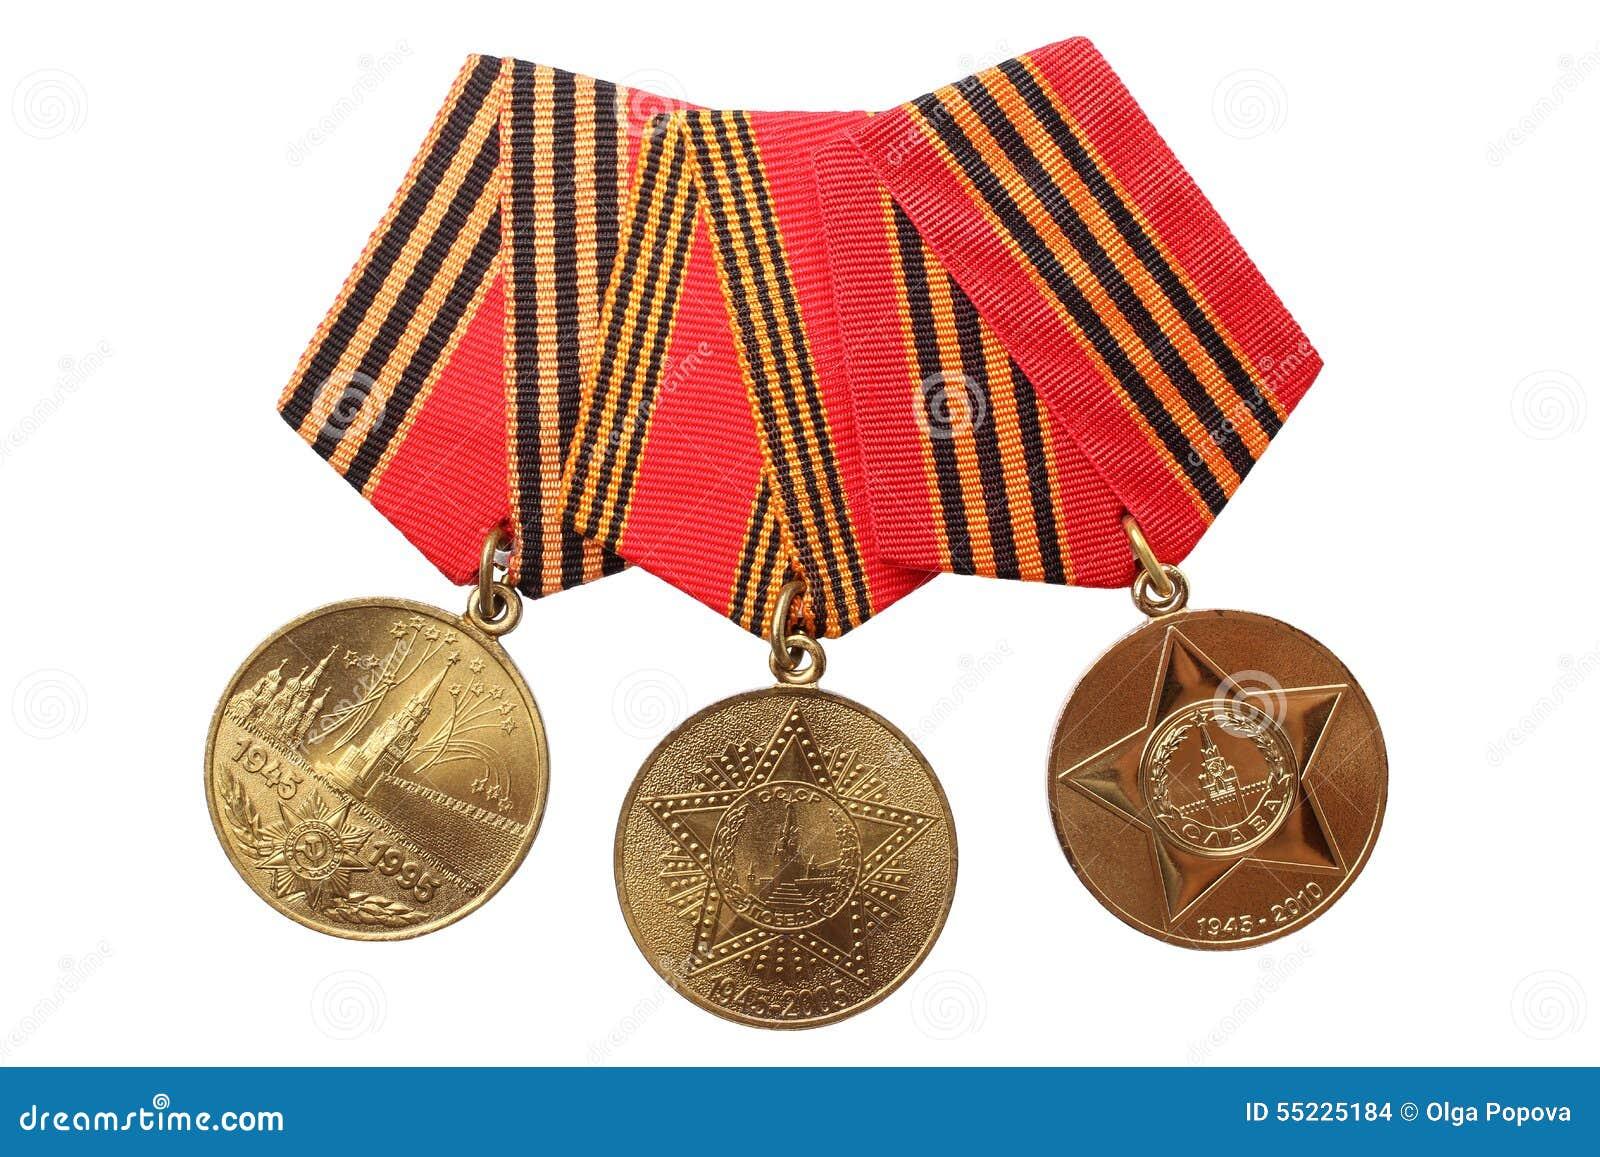 Great Patriotic War (term)